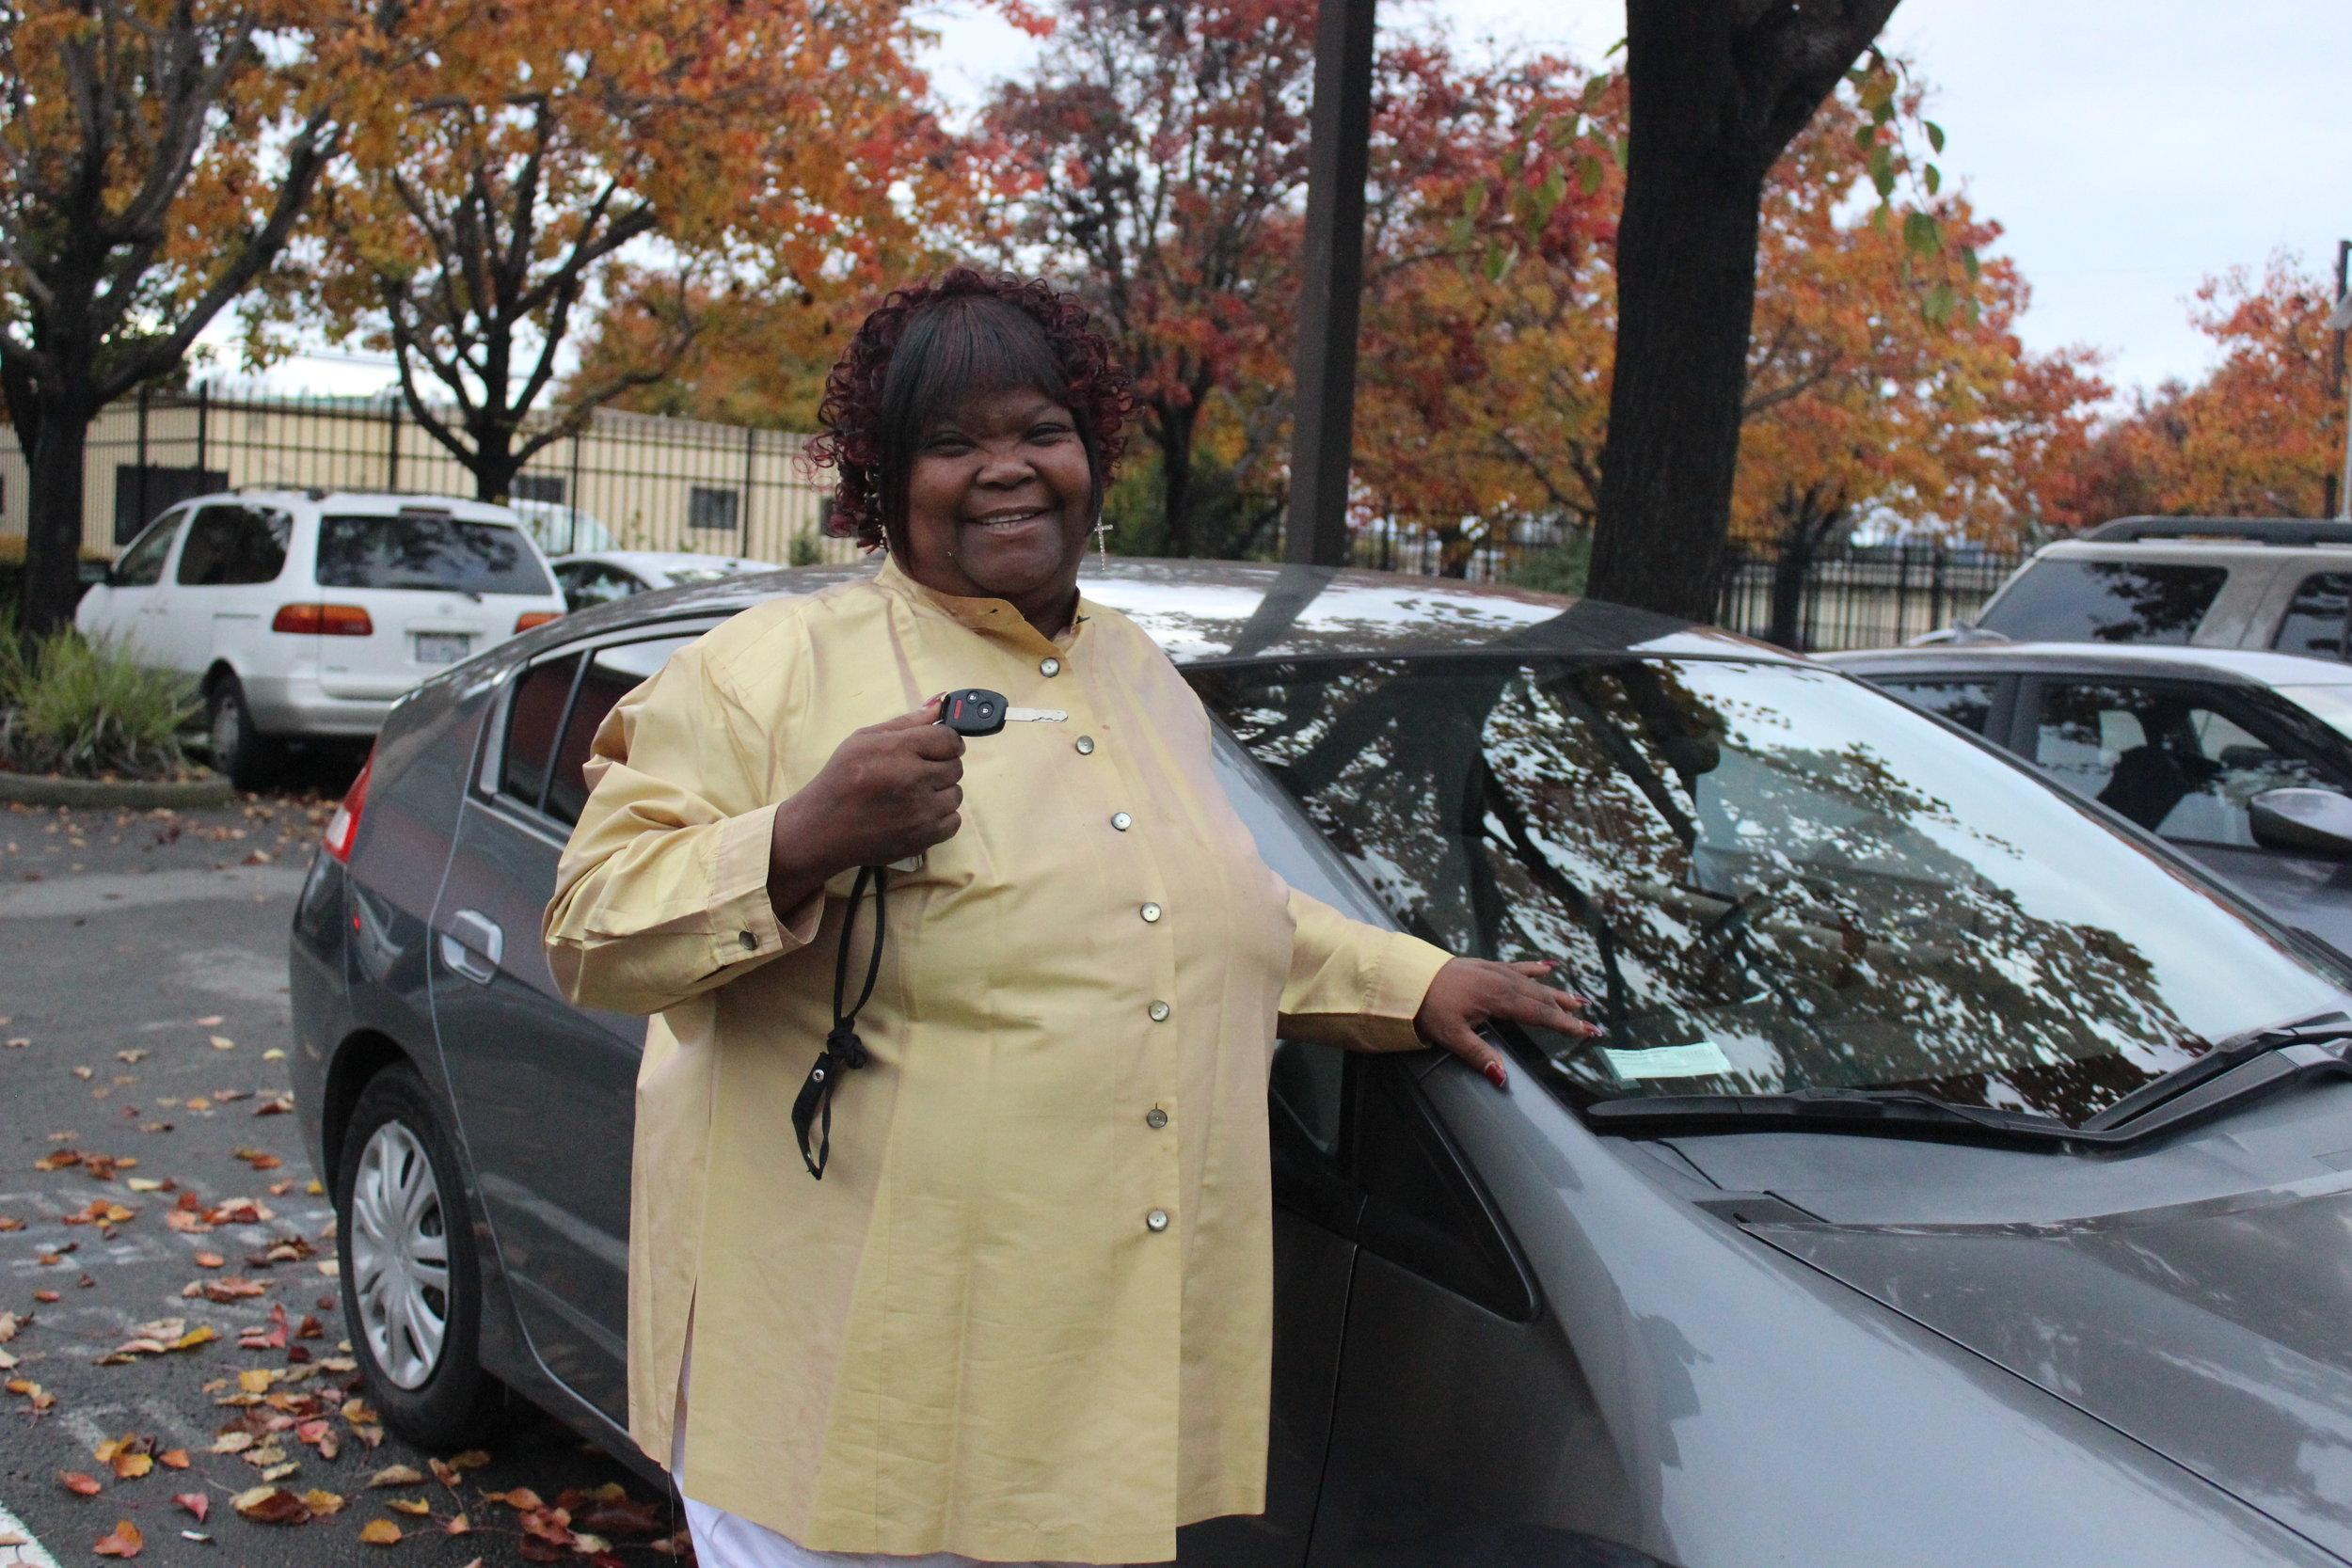 Marie Deer receives the keys to her new clean car